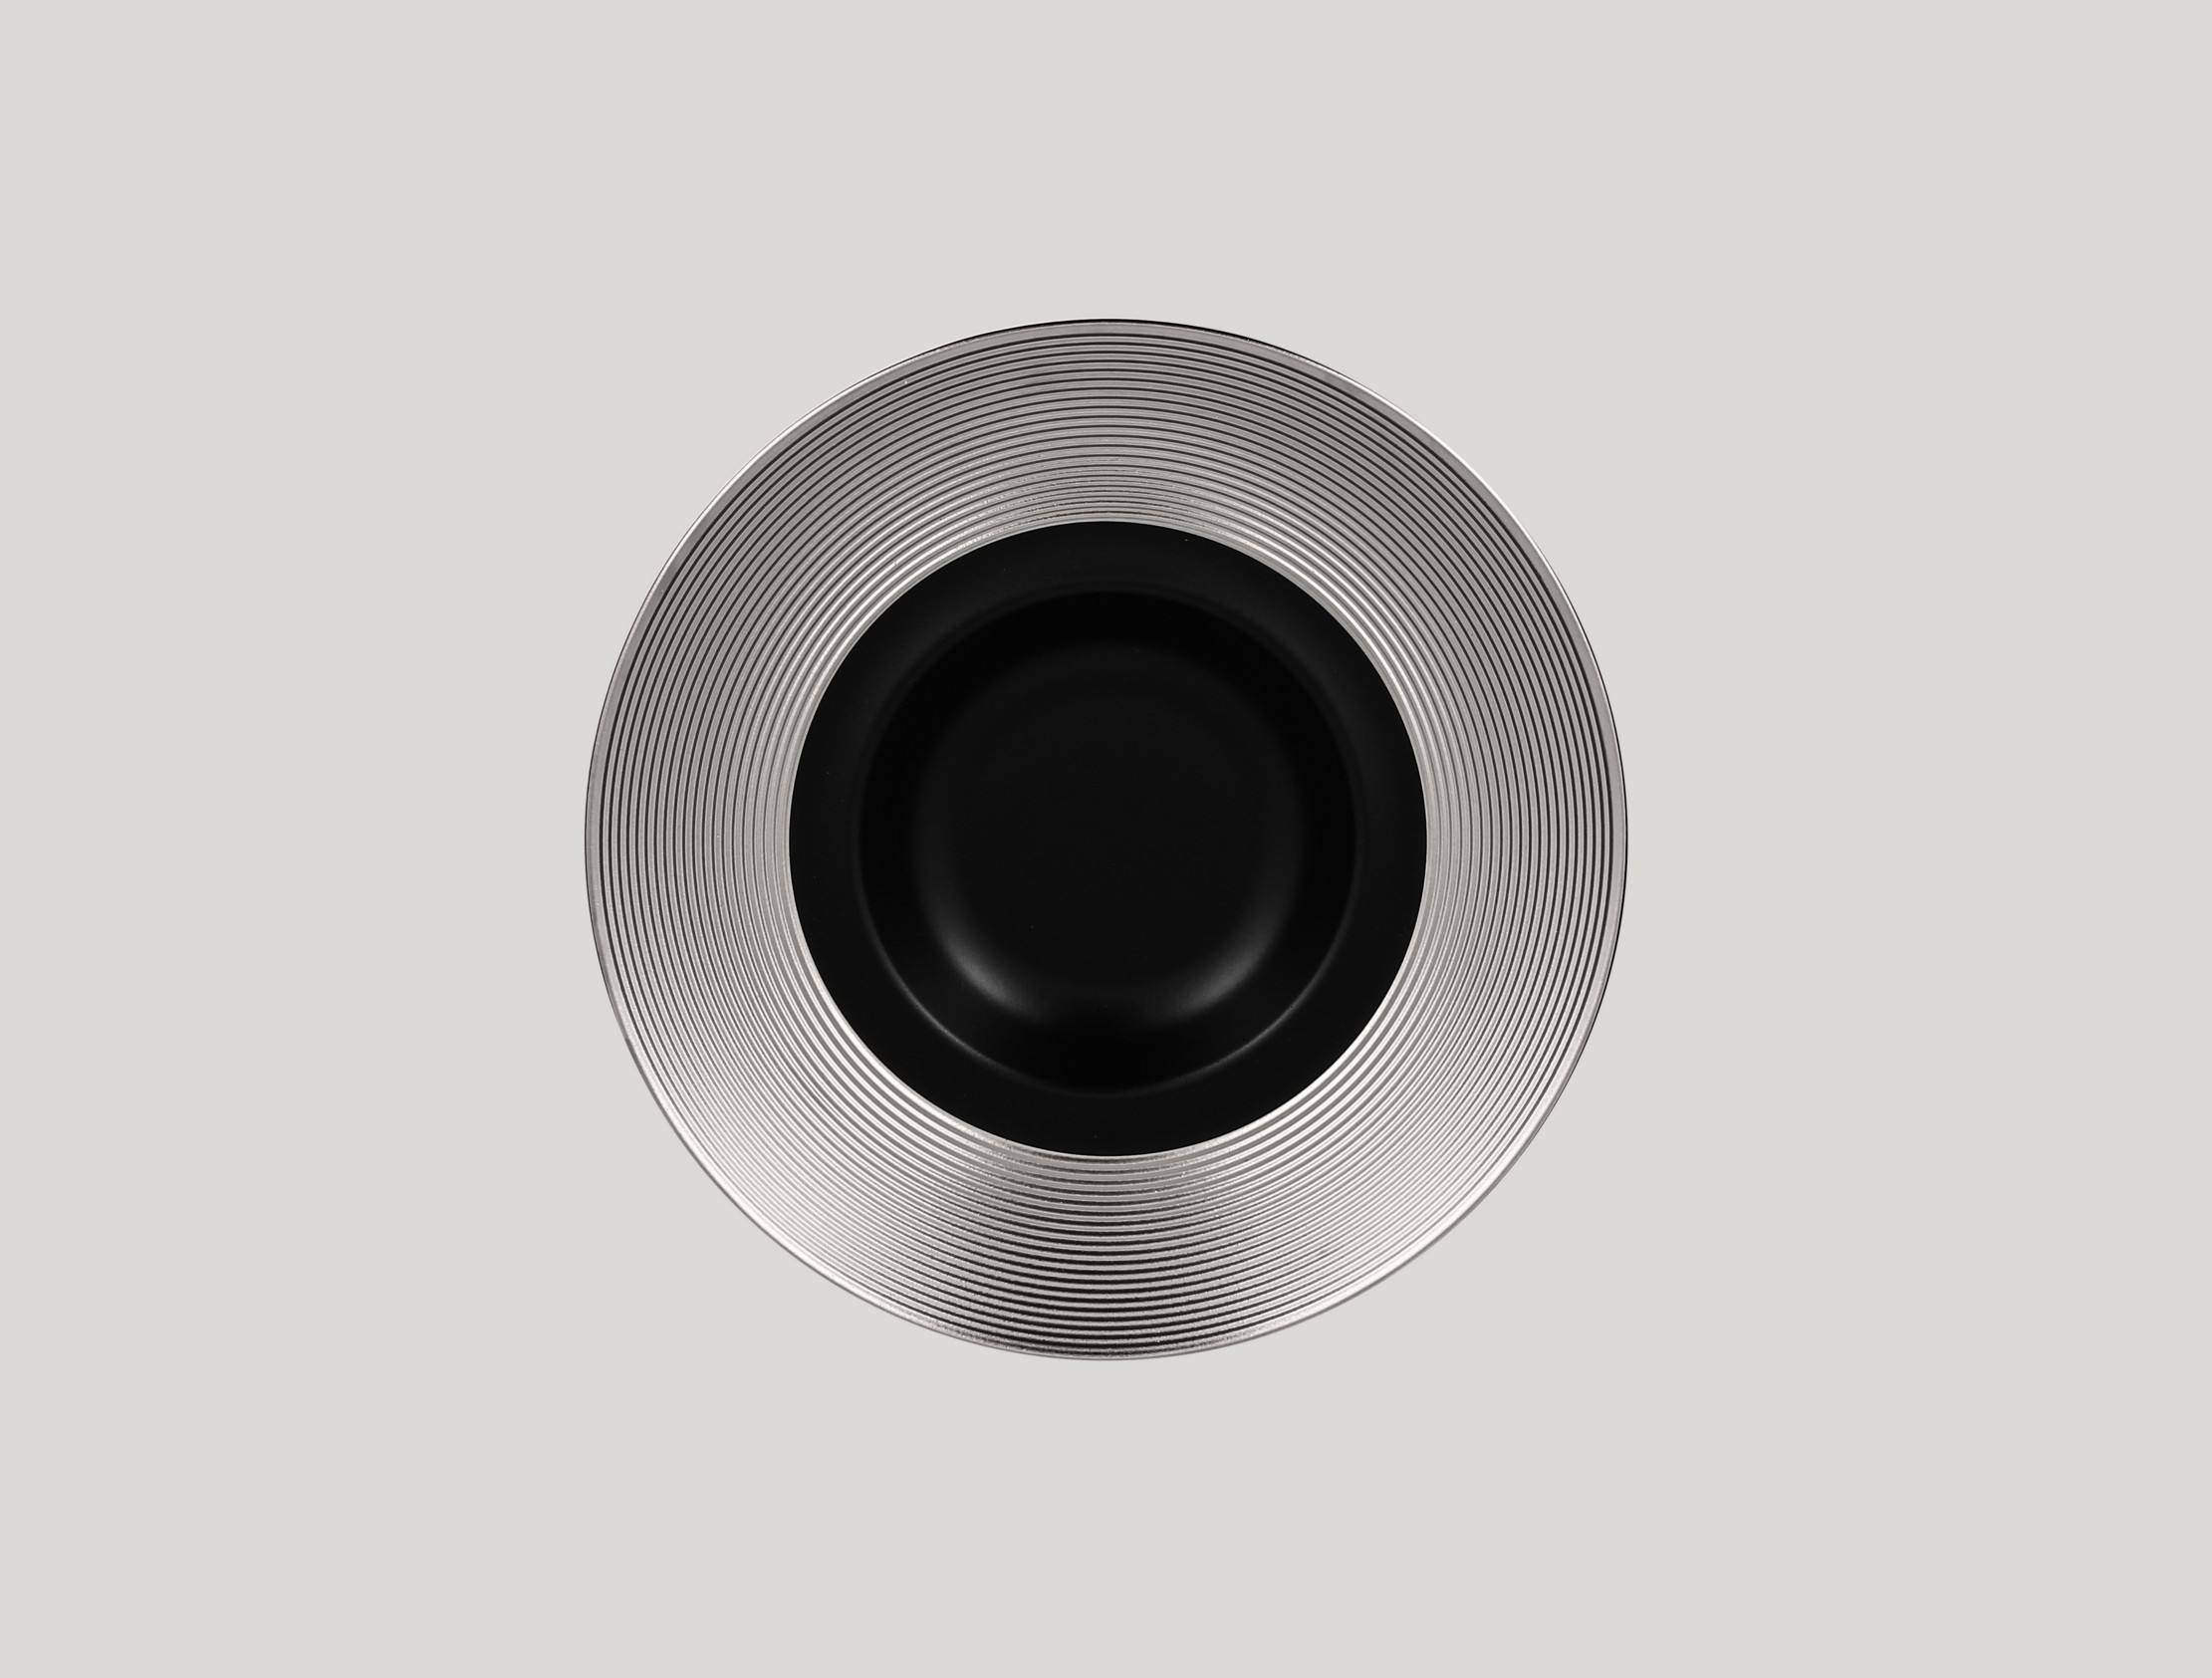 Gourmet hluboký talíř - silver ANTIC